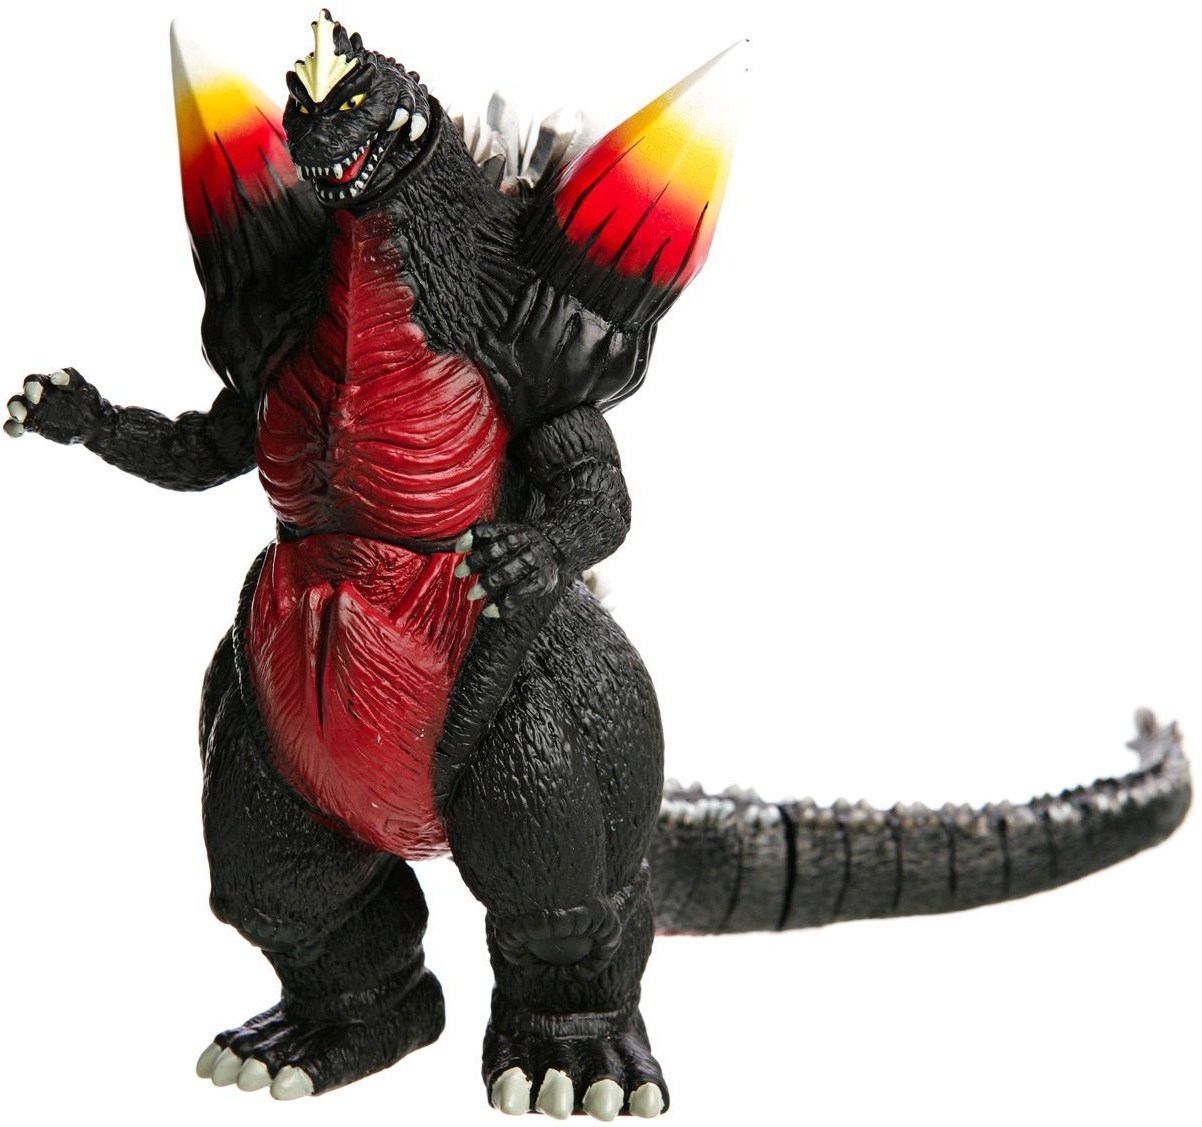 Space Godzilla Toys 54